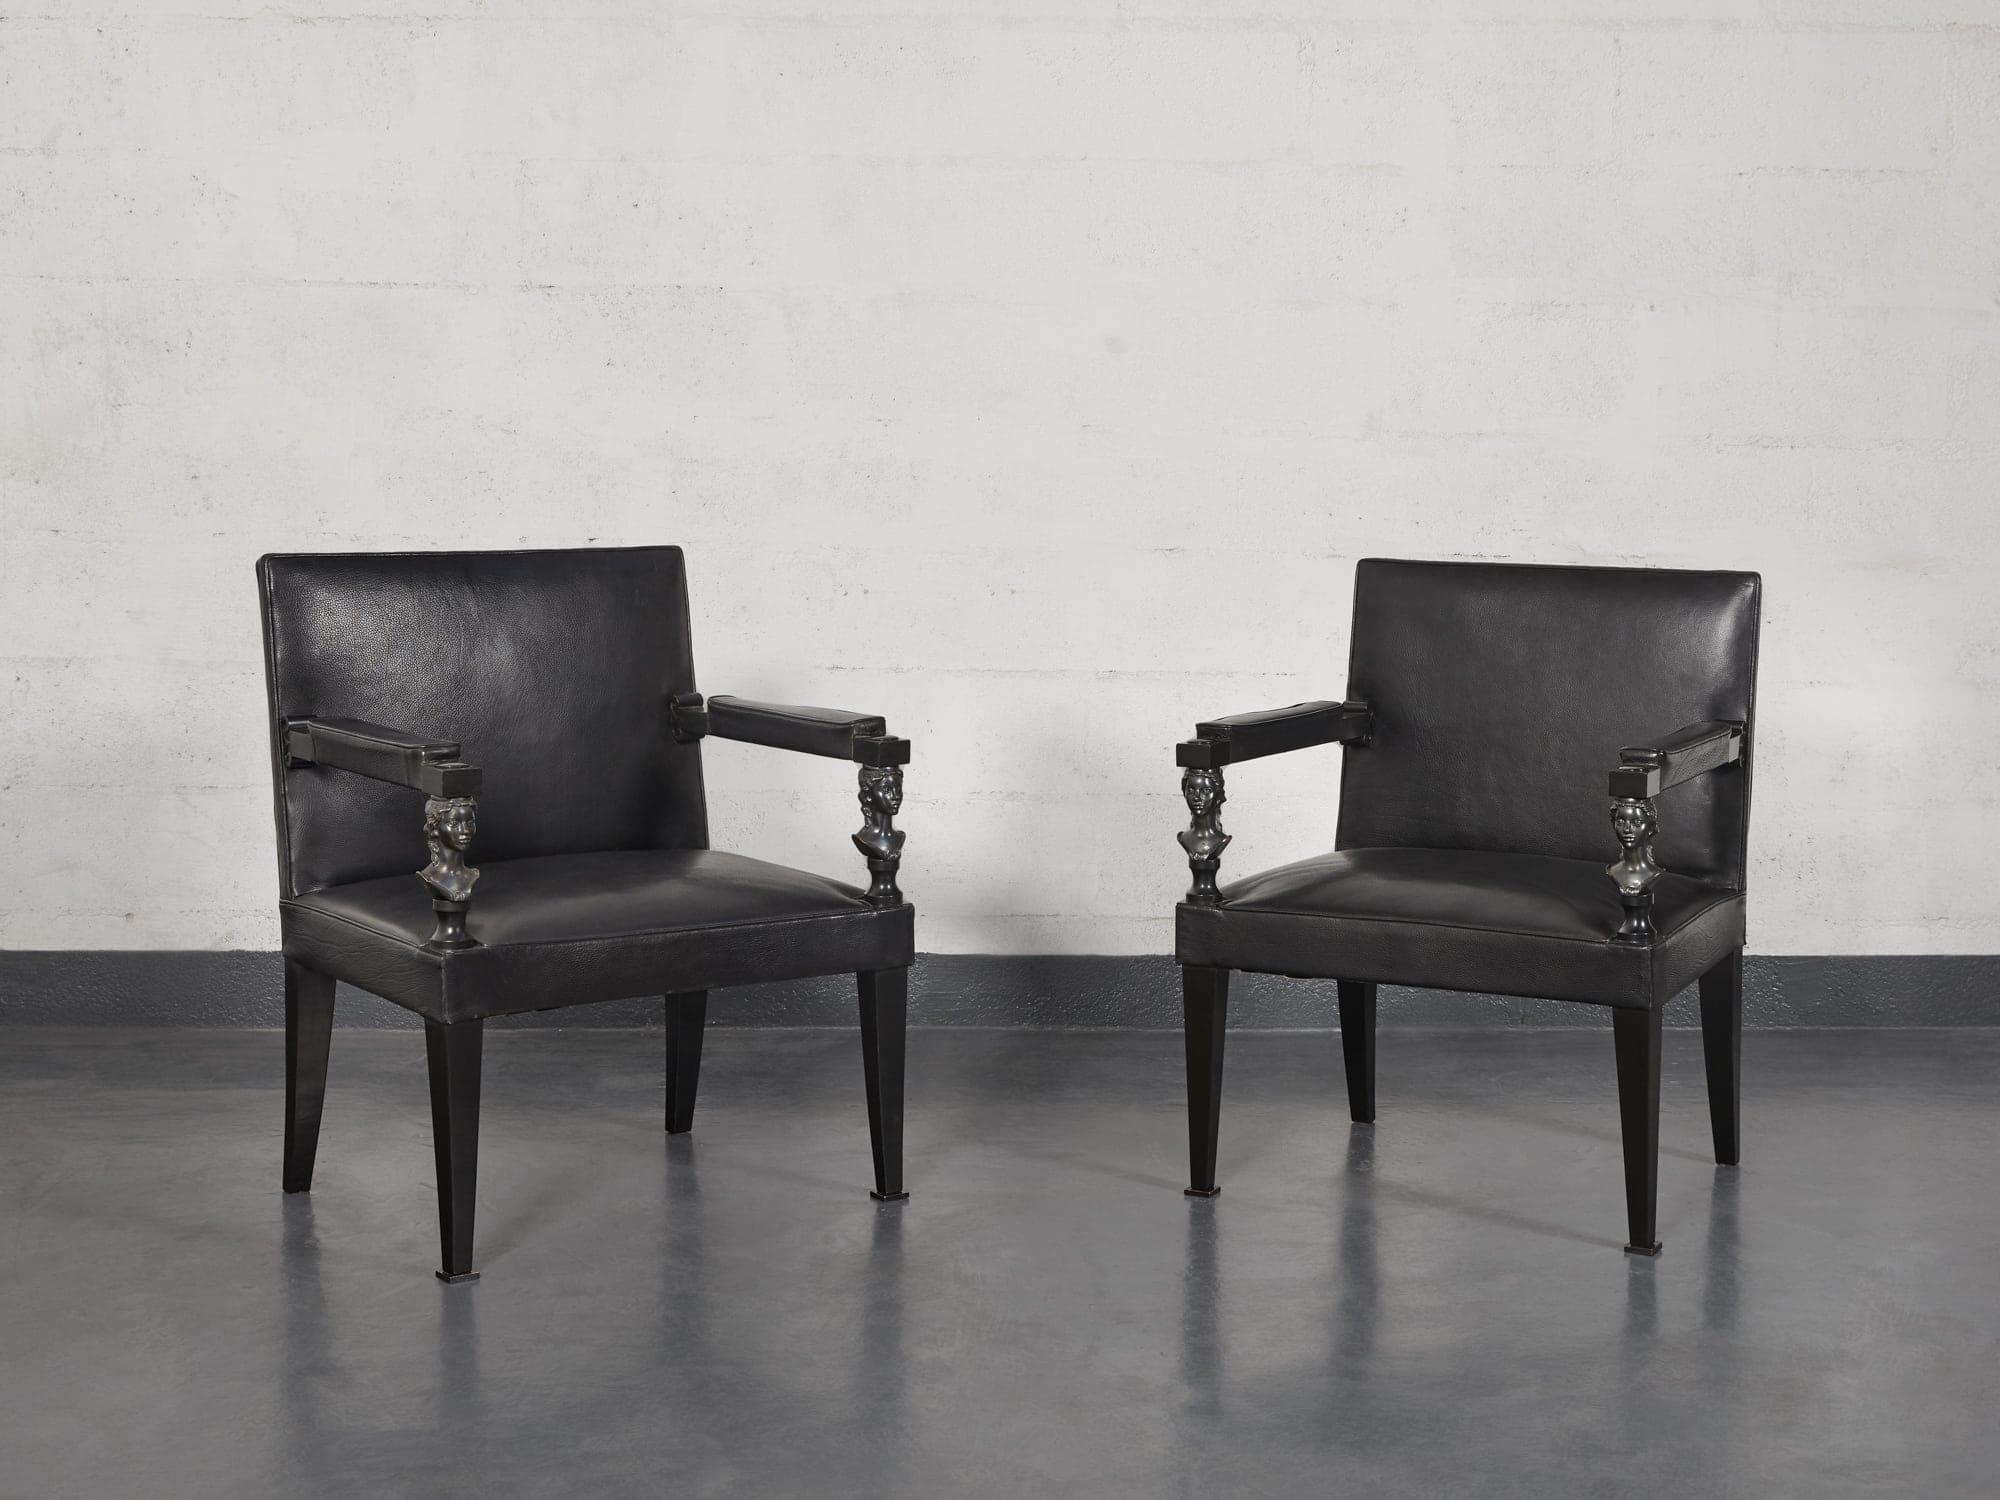 André Arbus & Vadim Androusov, Pair of armchairs, vue 01